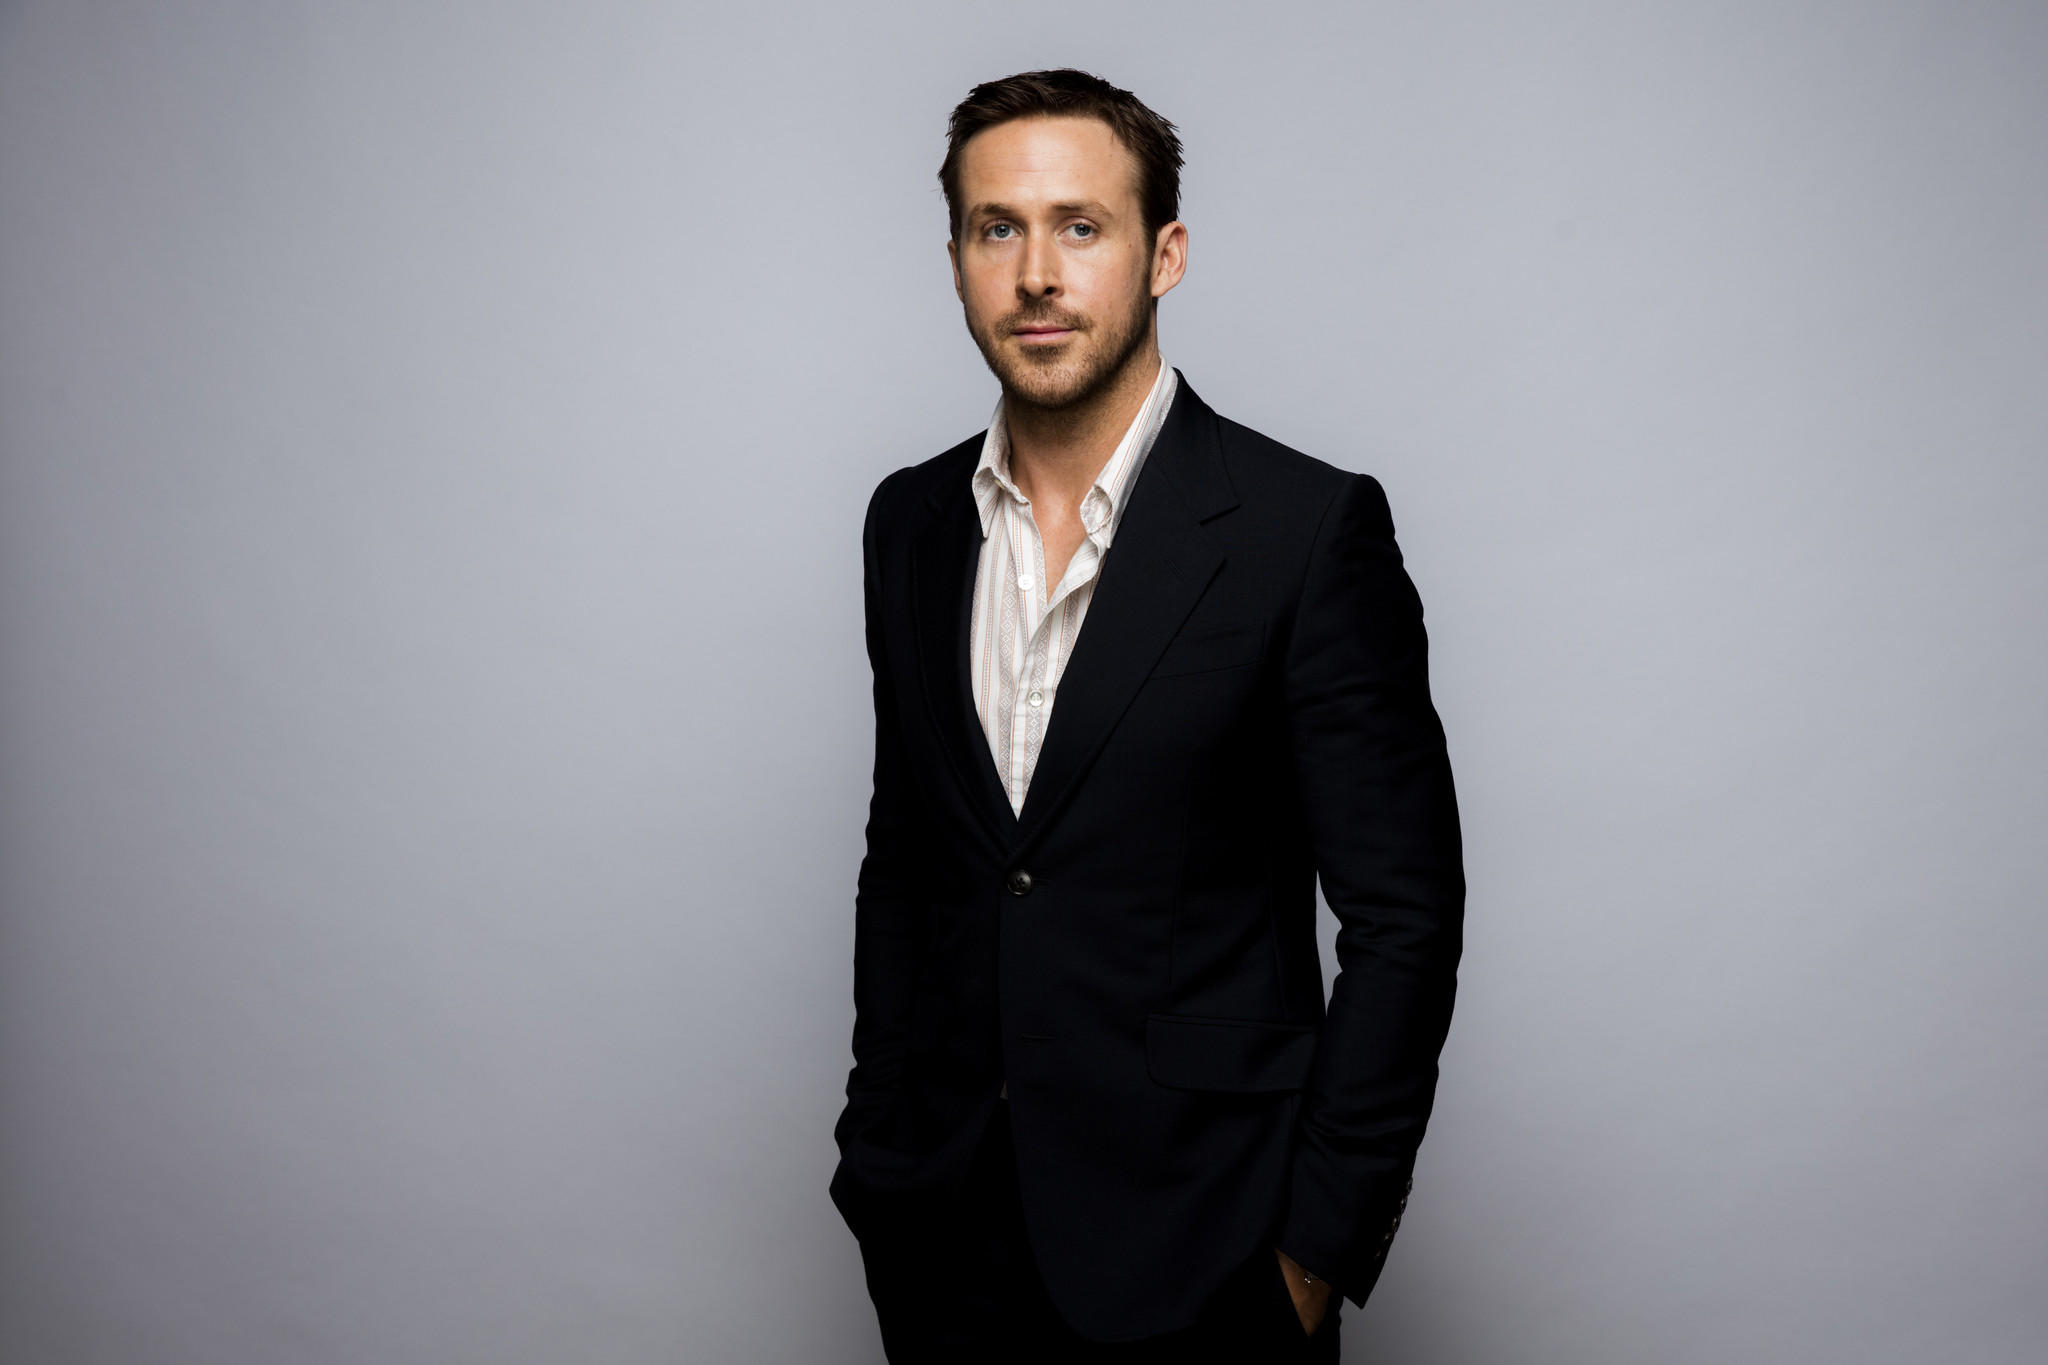 Ryan Gosling (Jay L. Clendenin / Los Angeles Times)